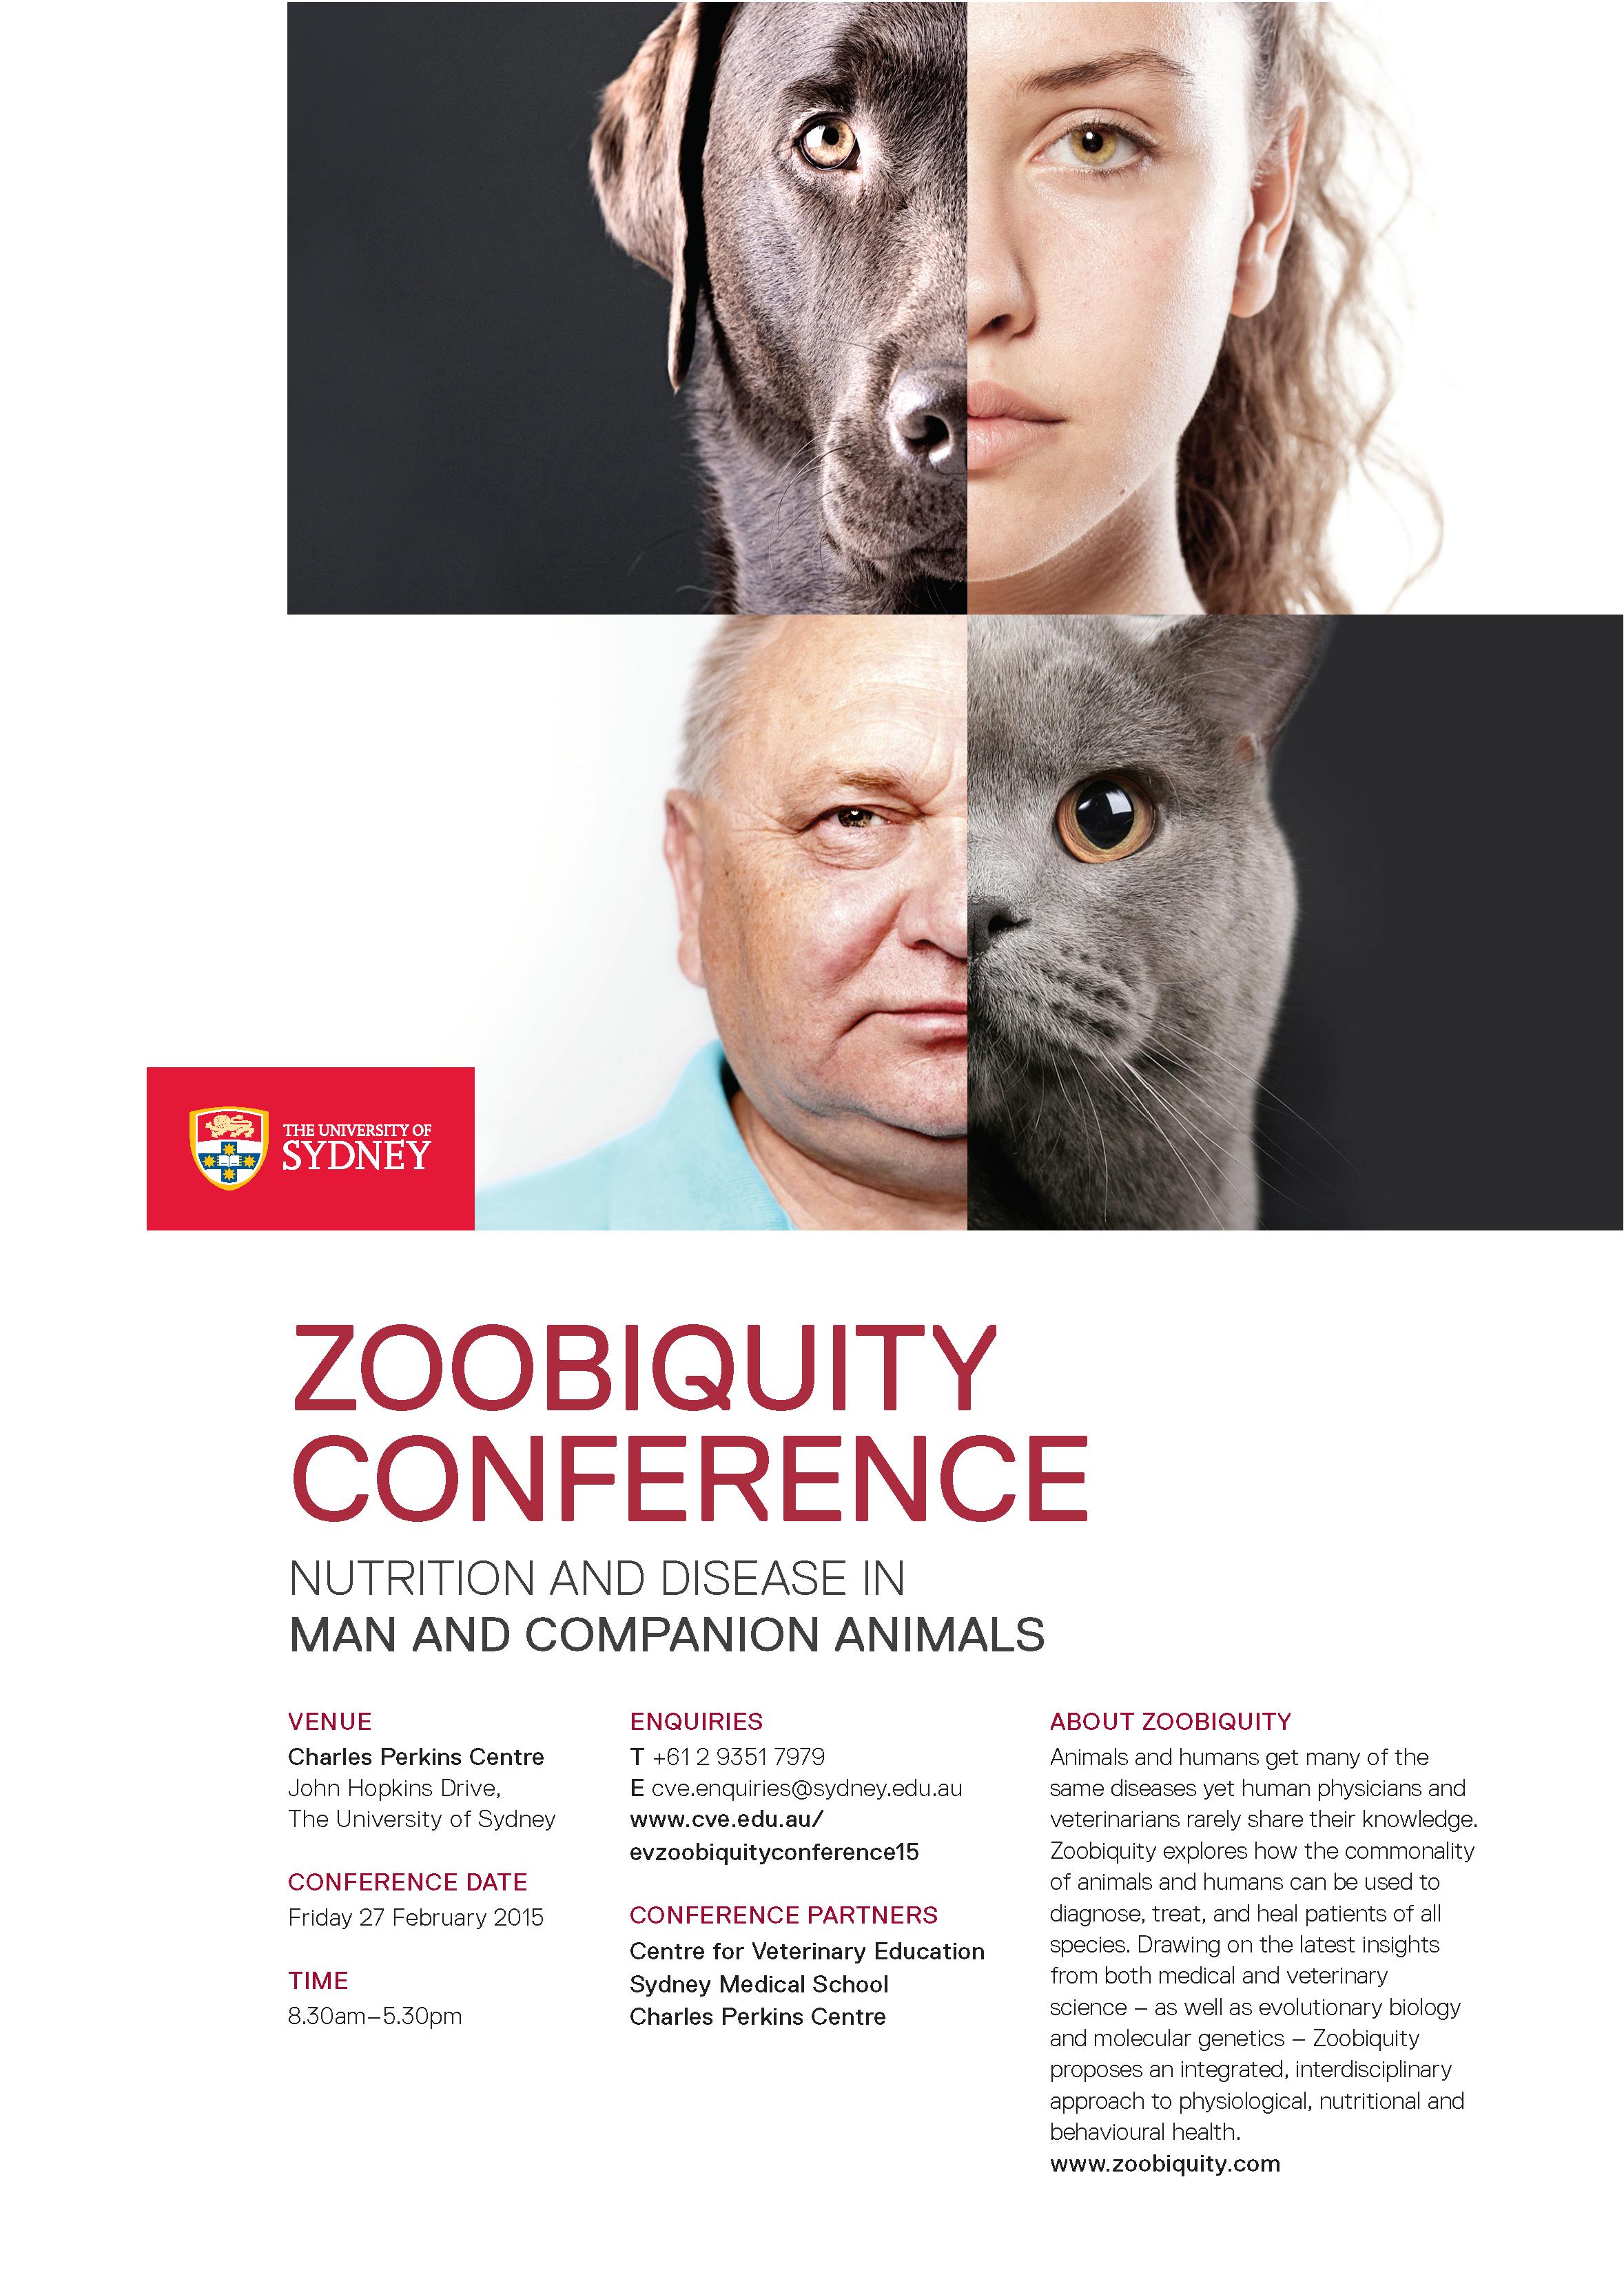 Zoobiquity_Sydney_Australia_2015_Page_1.png